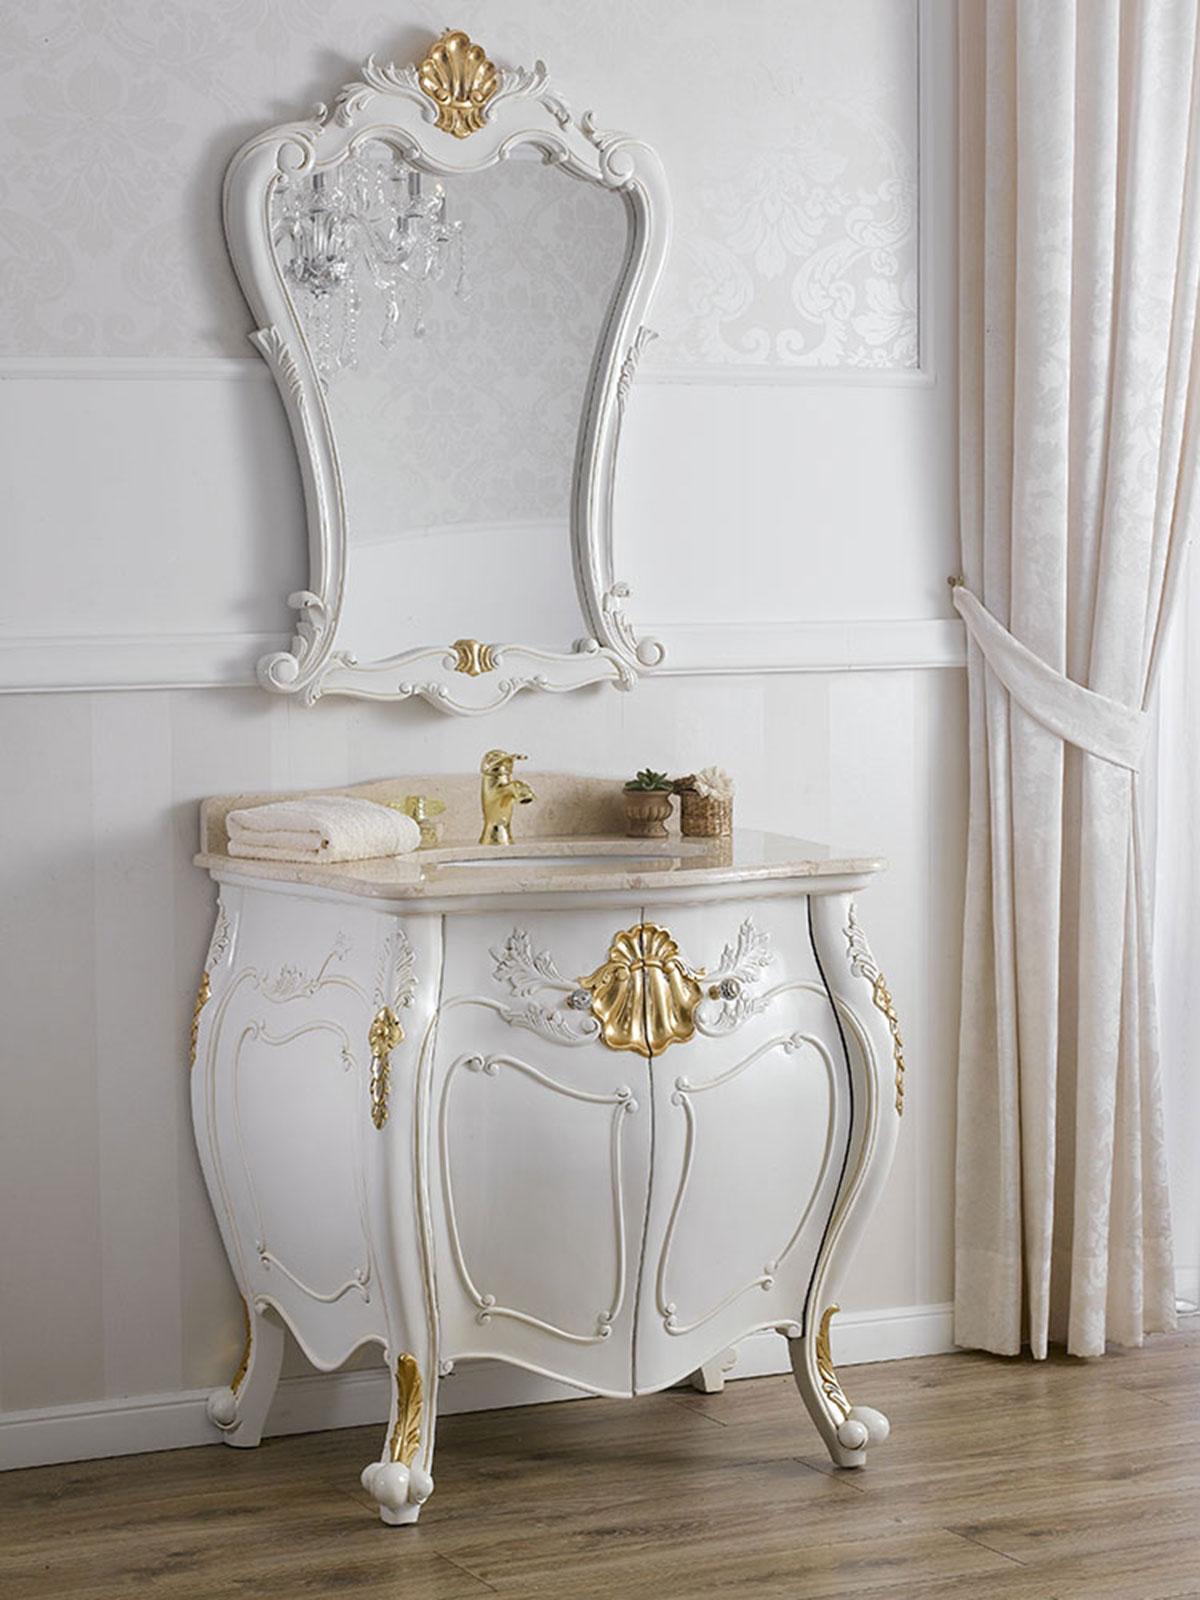 meuble salle de bain avec miroir anderson style baroque. Black Bedroom Furniture Sets. Home Design Ideas